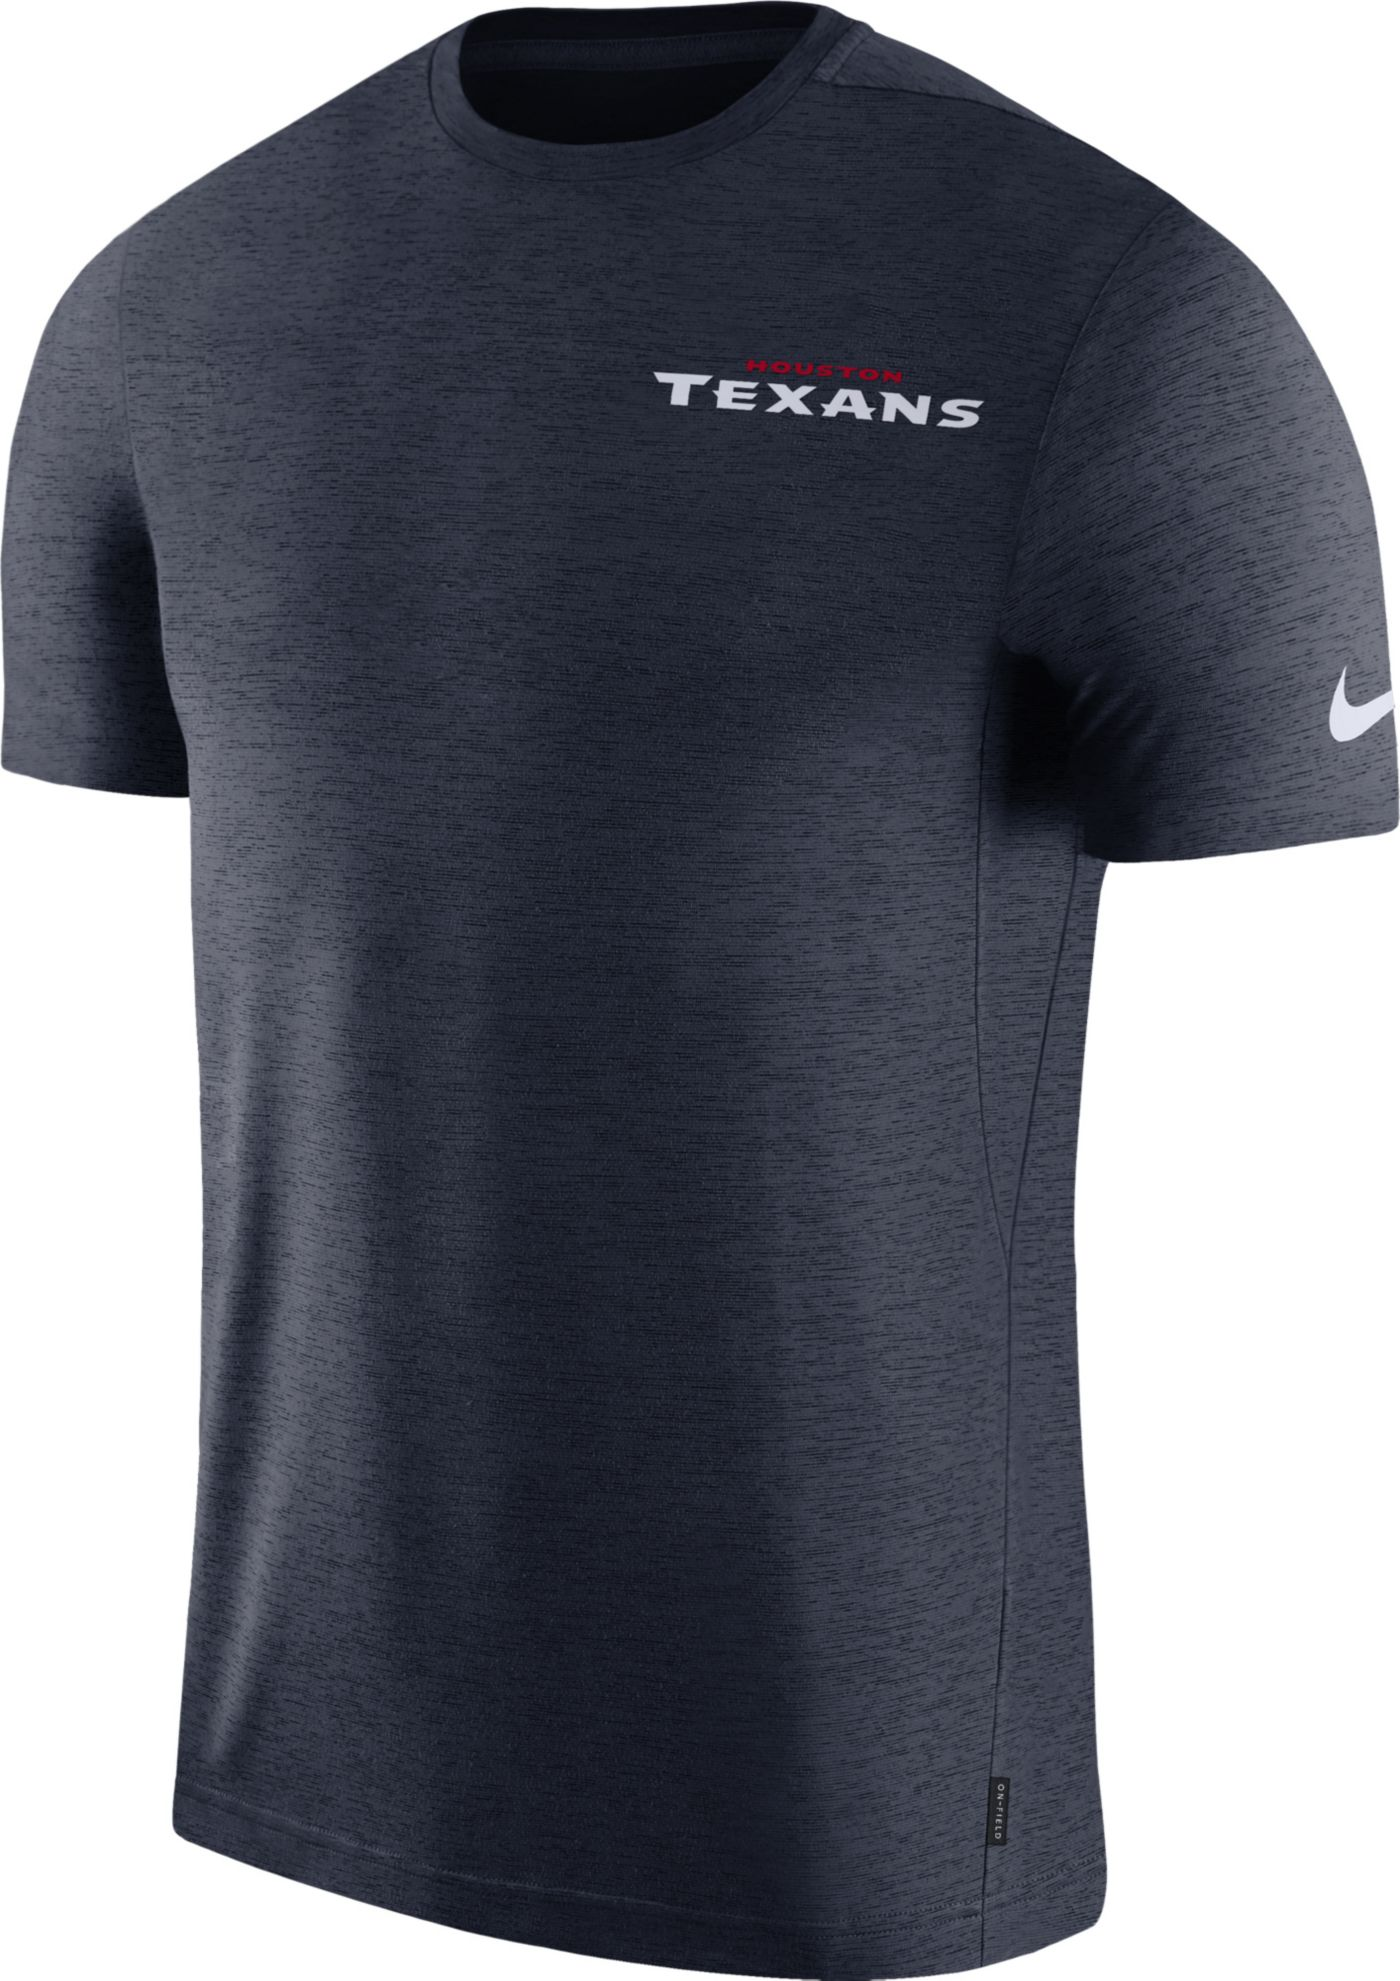 Nike Men's Houston Texans Sideline Coach Performance Navy T-Shirt